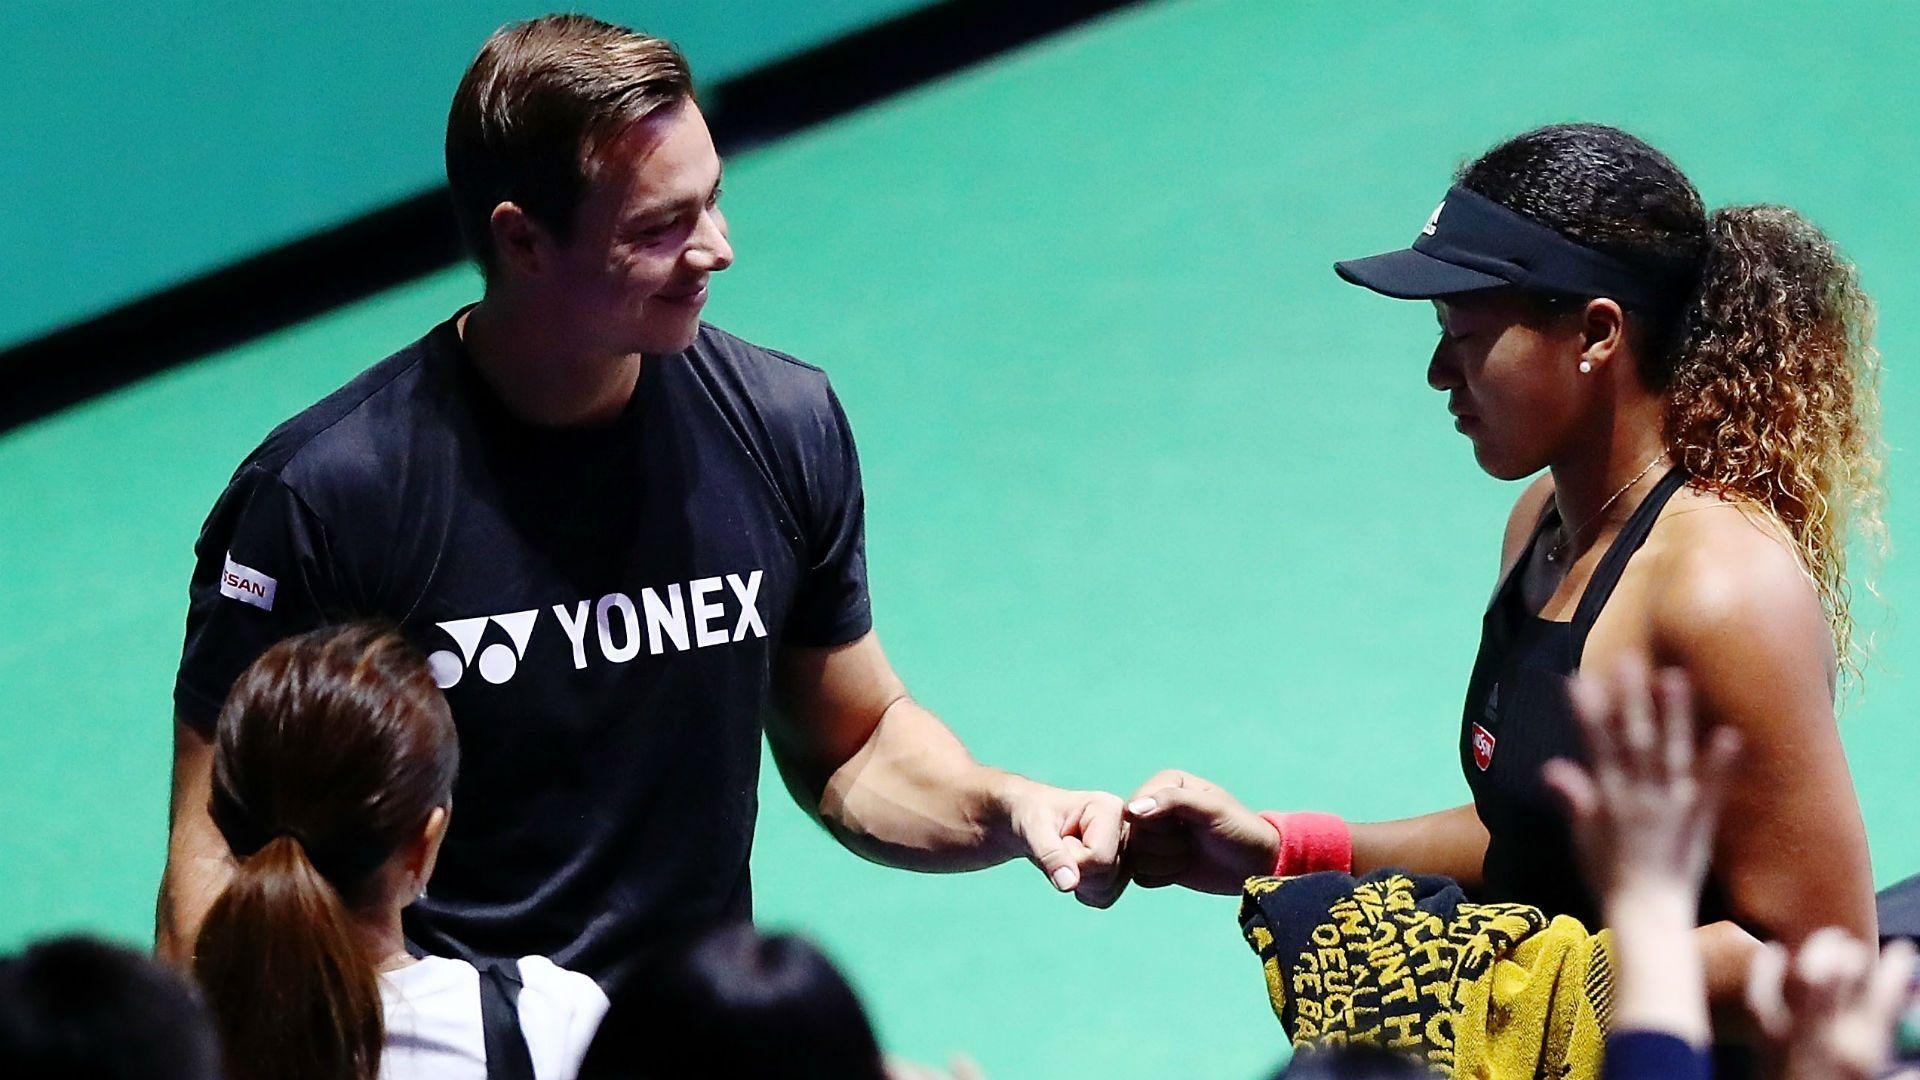 Naomi Osaka S Coach Sascha Bajin Named Wta Coach Of The Year Tennis Players Female Ladies Golf Tennis Stars